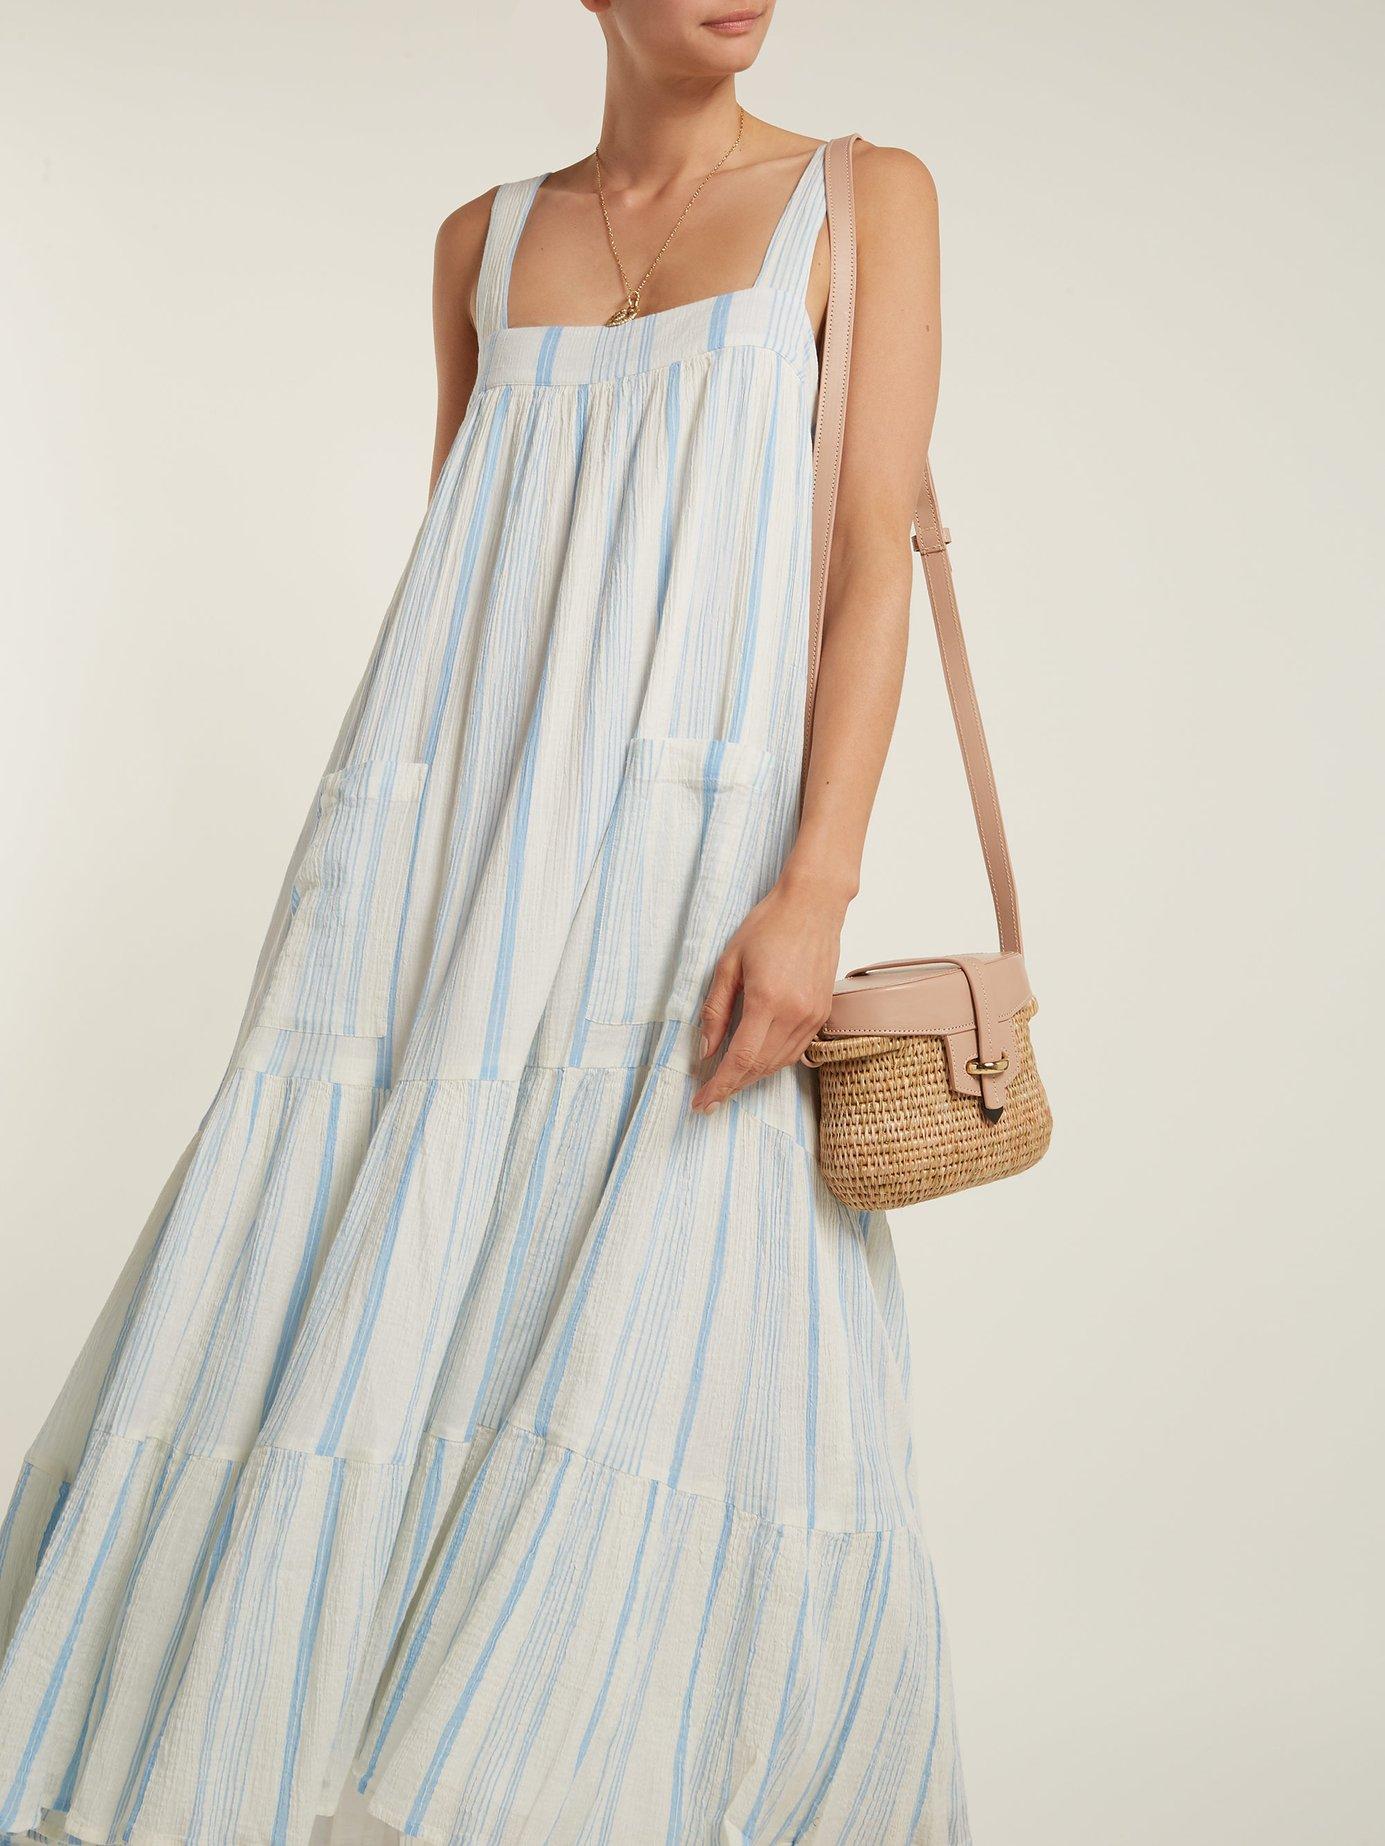 Tiered halter-neck cotton dress by Apiece Apart